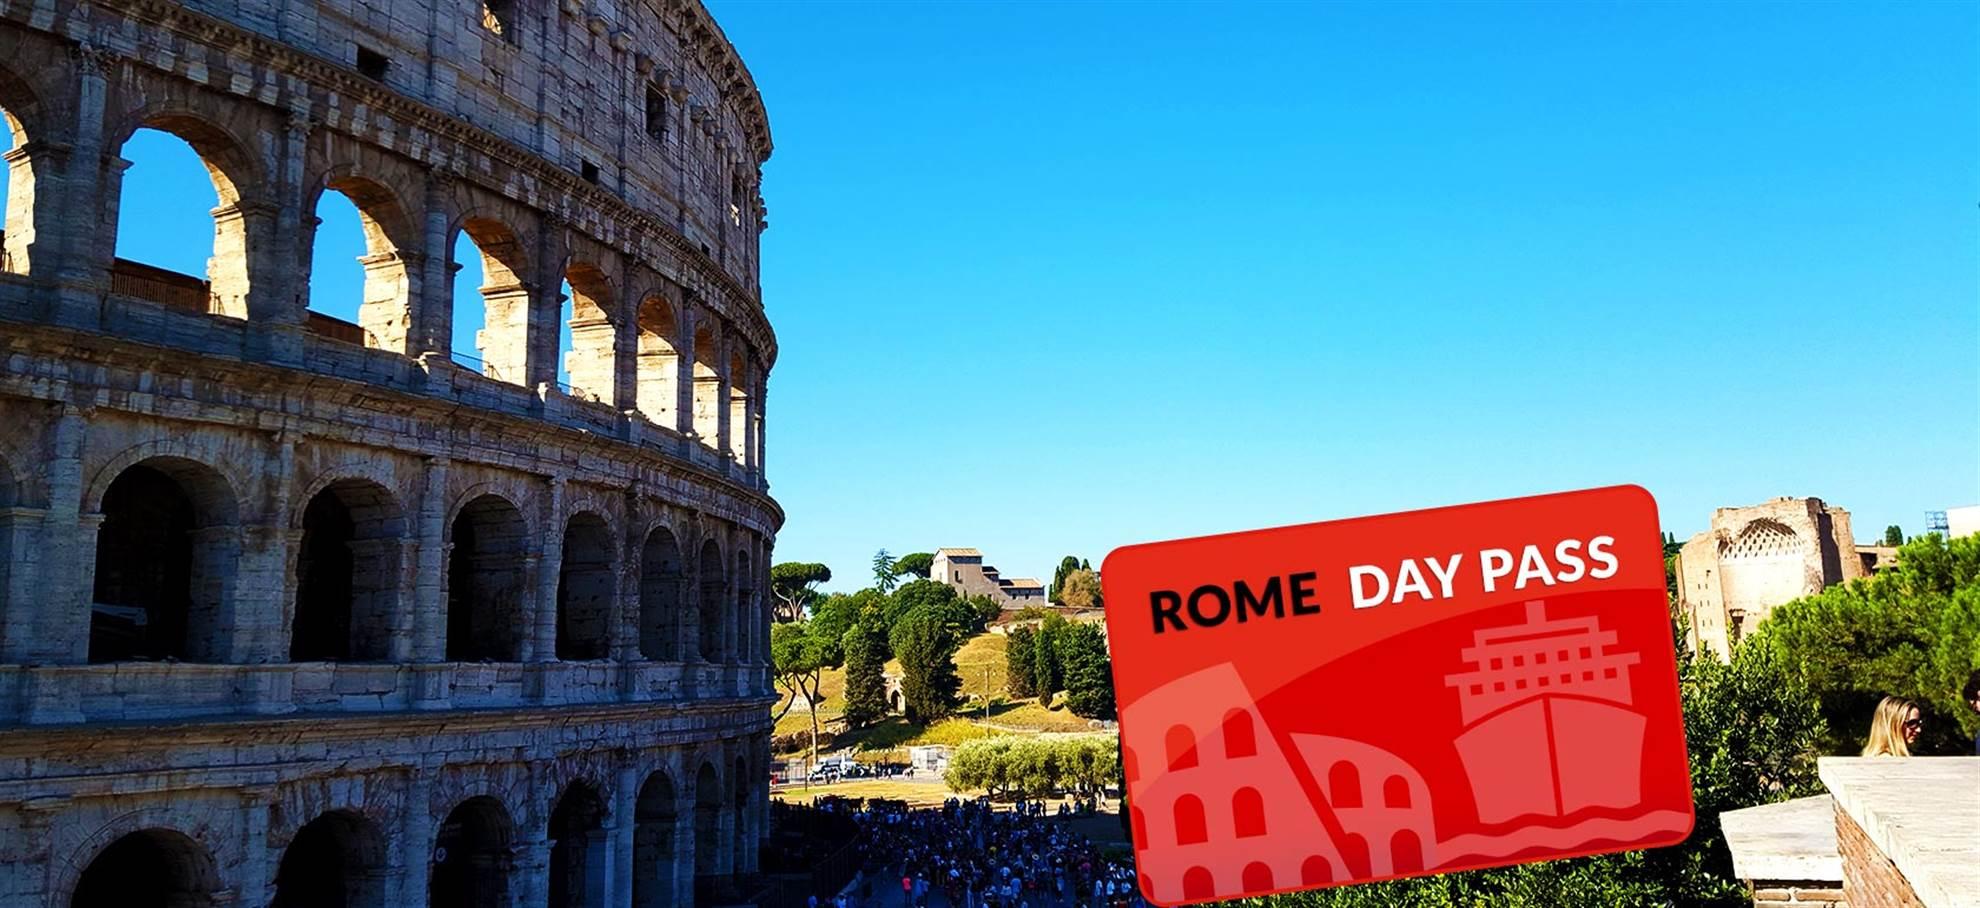 Rome dagpas vanaf Civitavecchia (Haven van Rome)